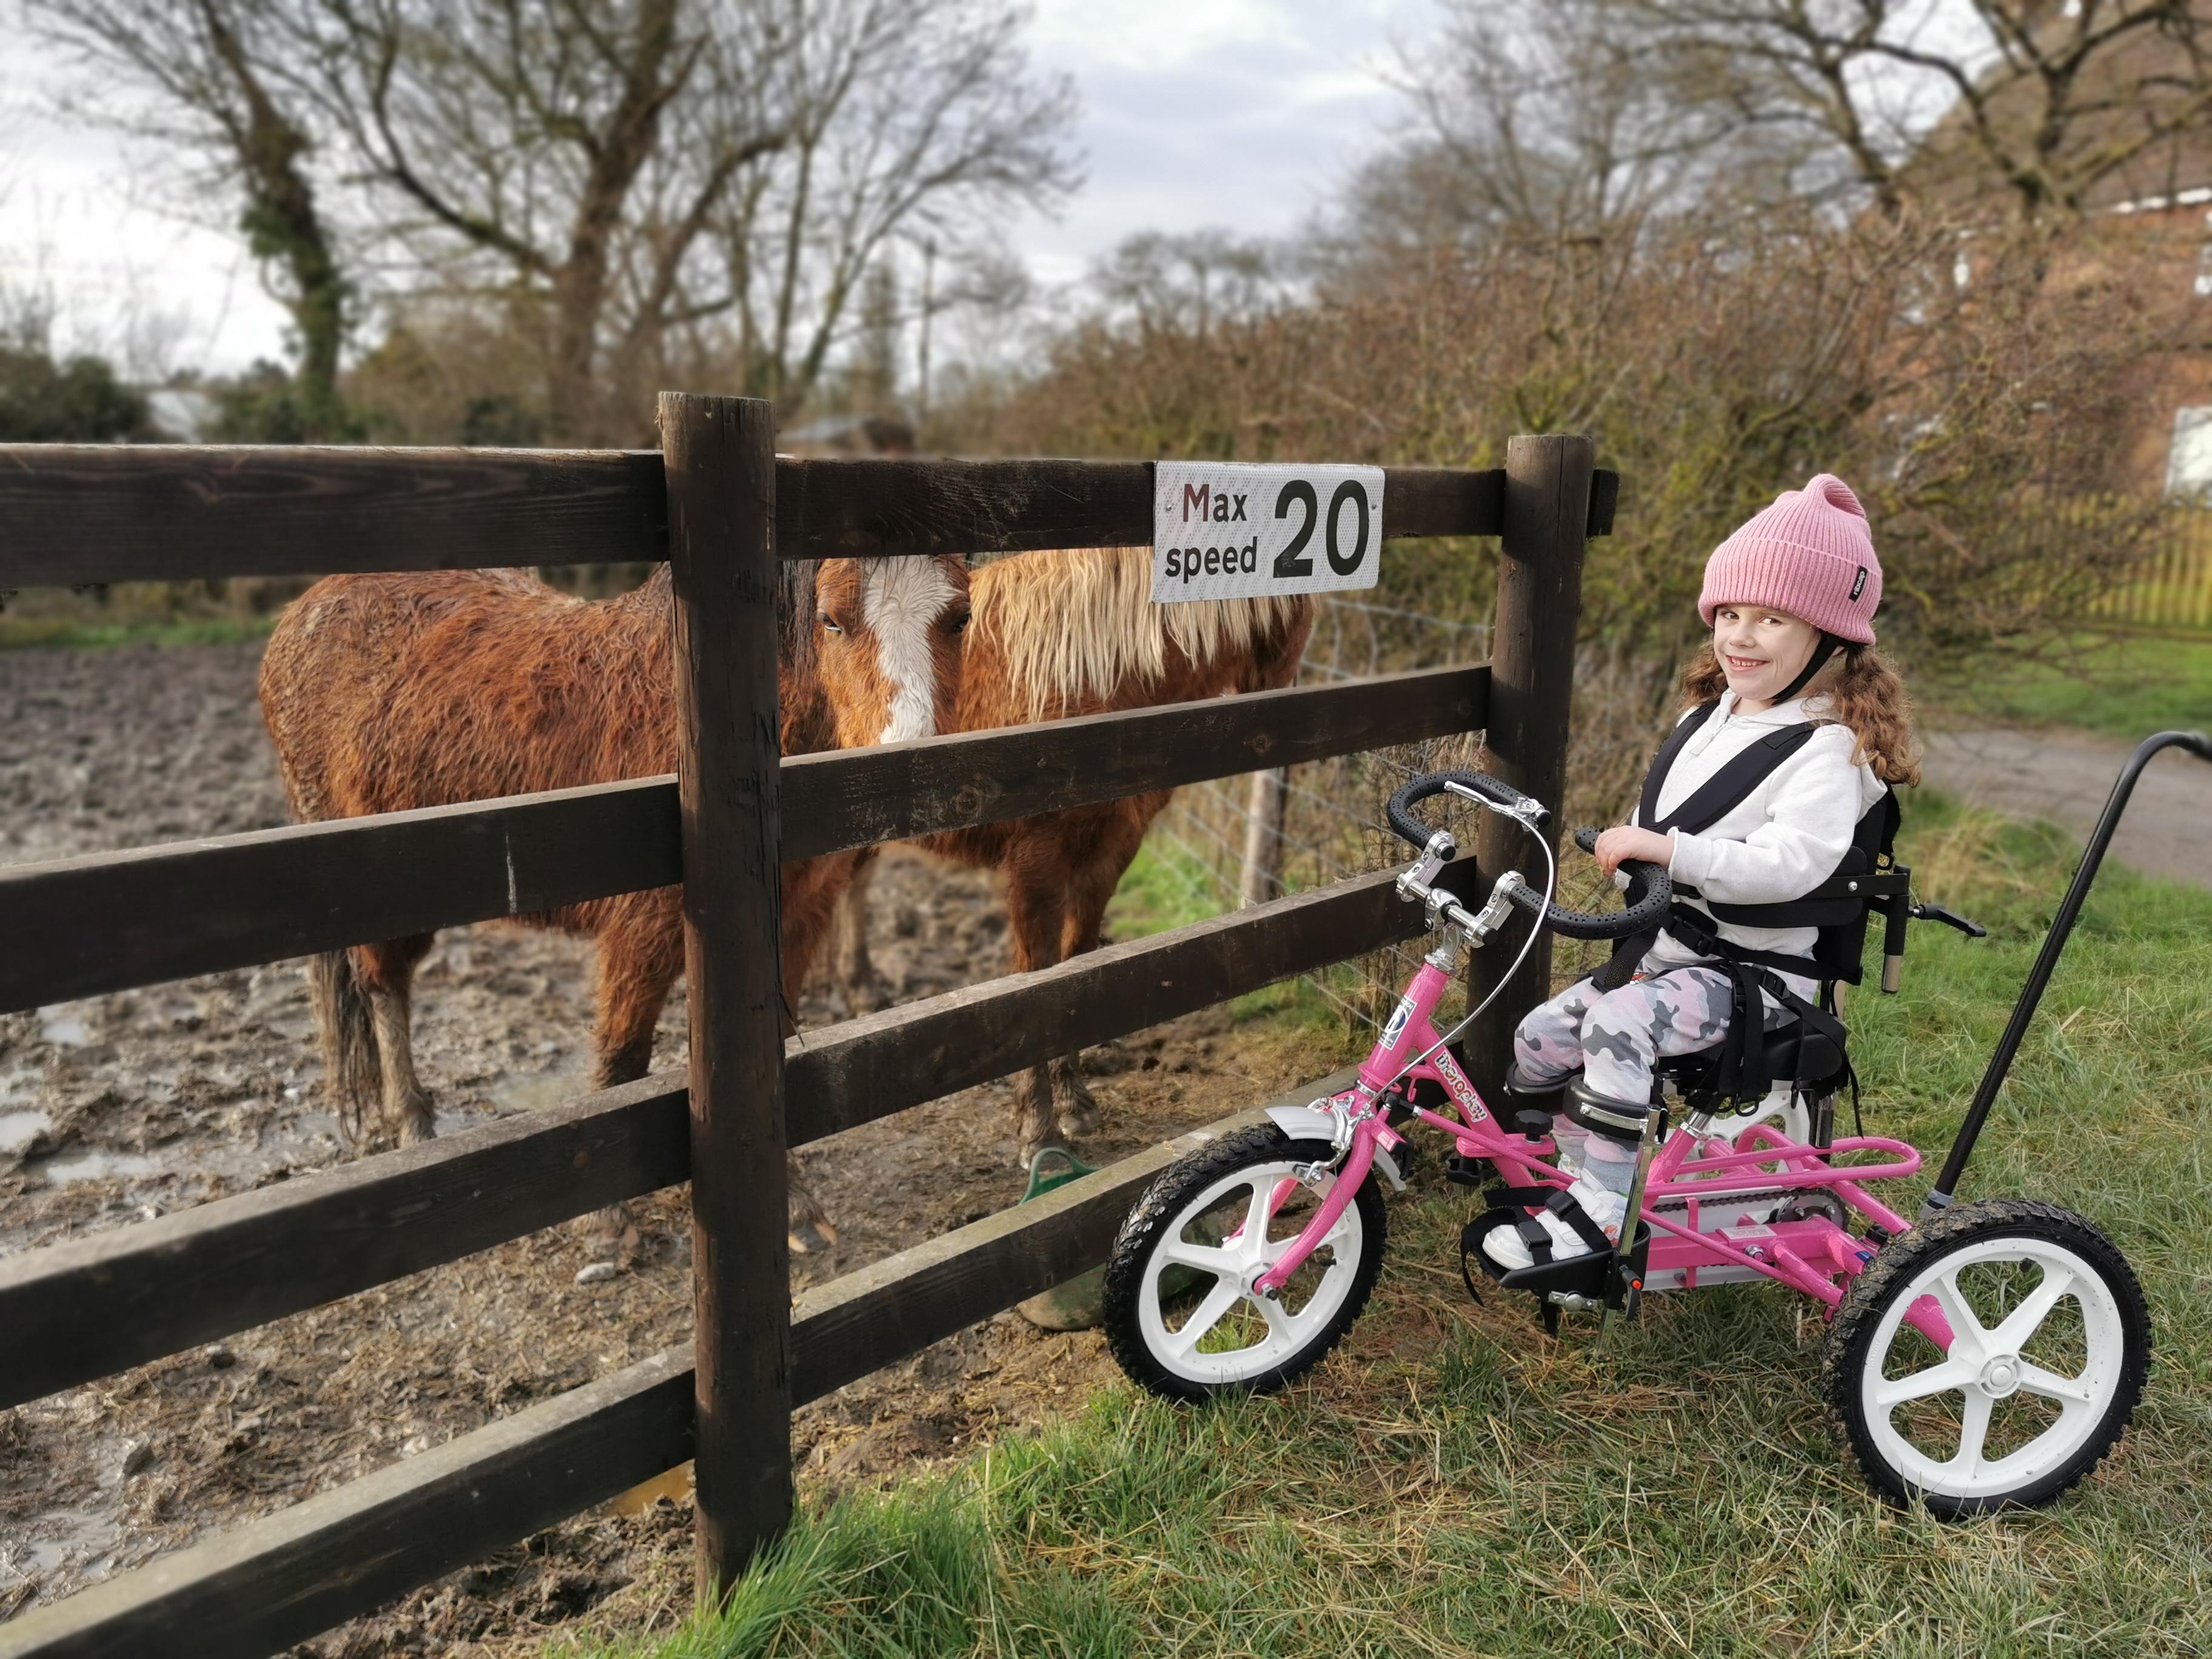 Carmela sming on her pink bike next to horses